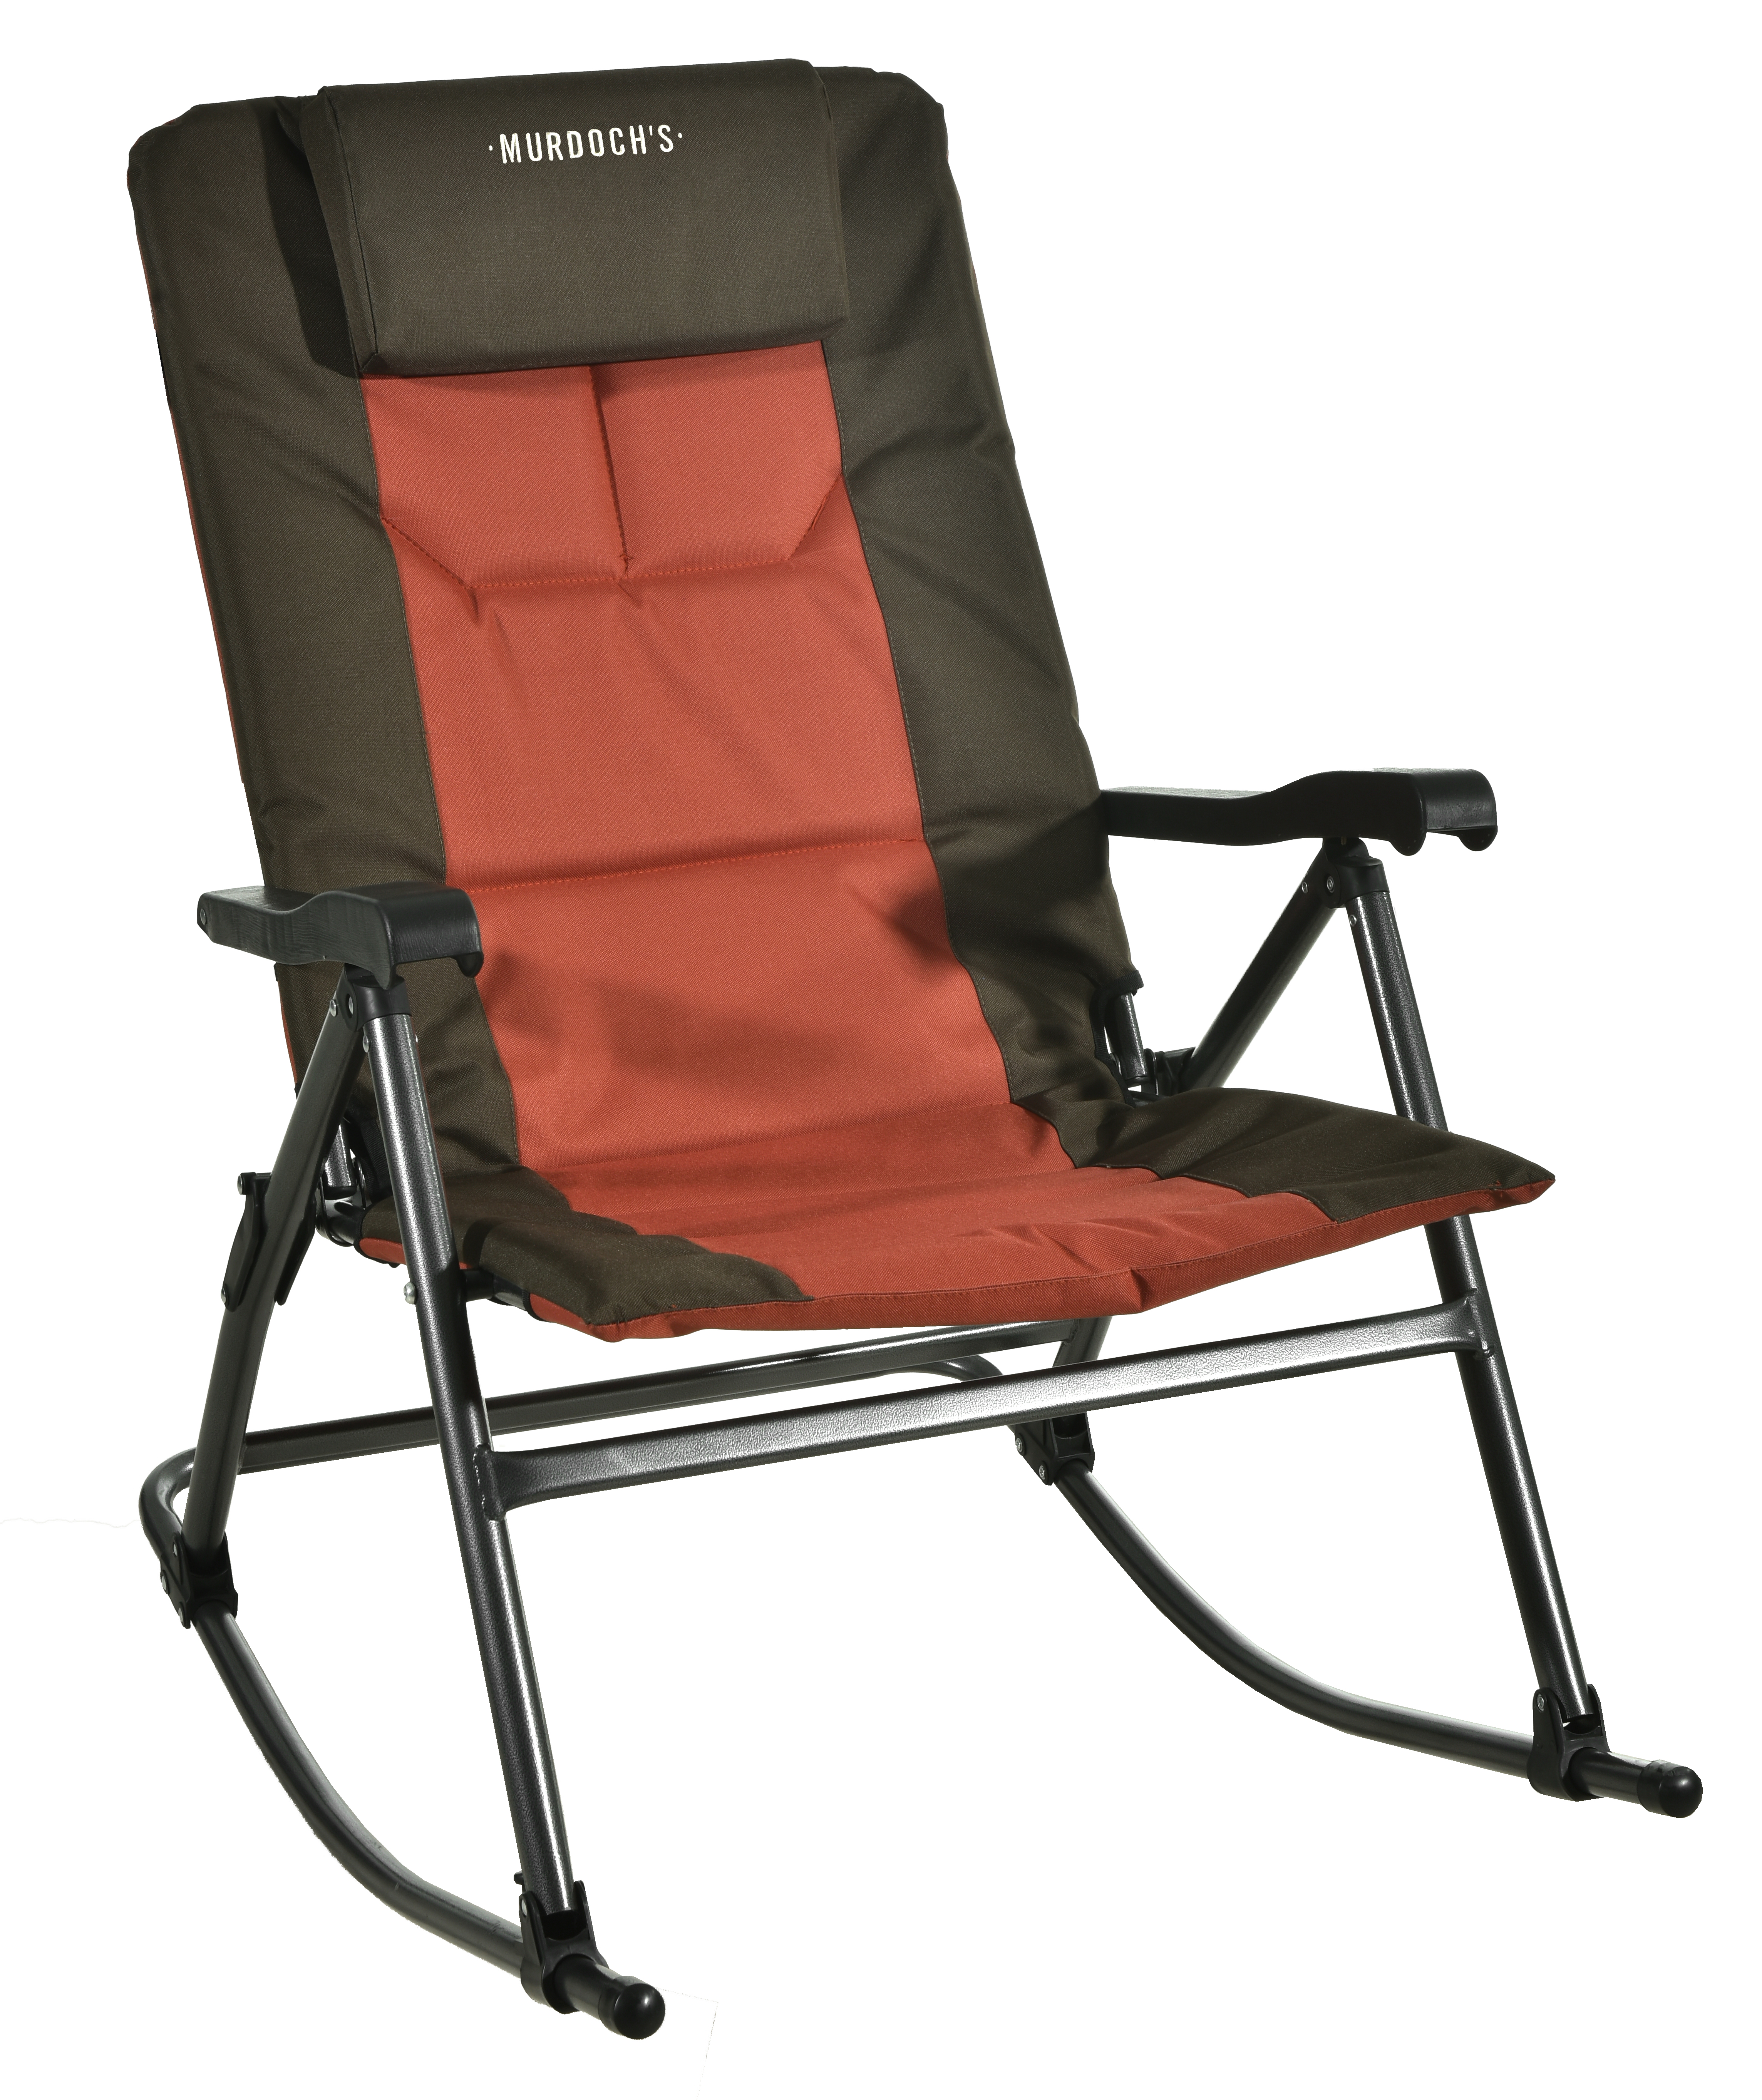 Excellent Multi Postion Rocking Chair Machost Co Dining Chair Design Ideas Machostcouk